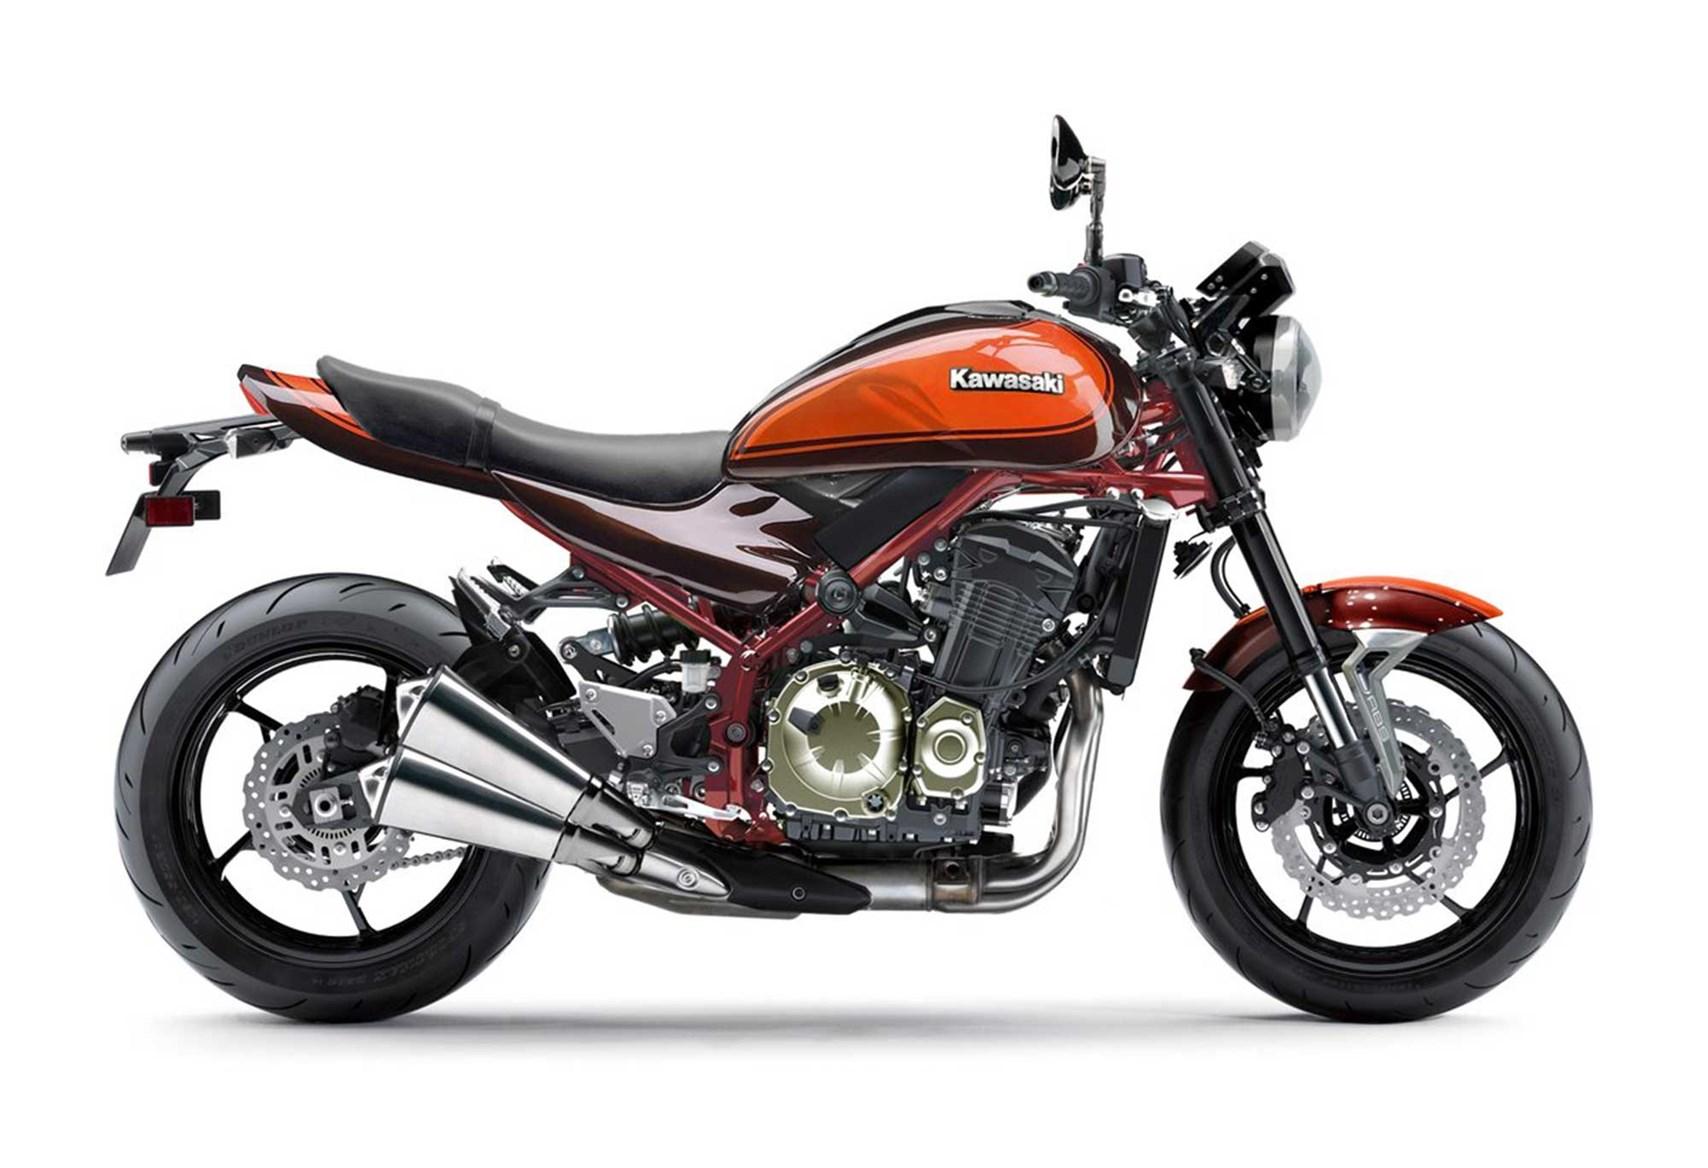 Kawasaki カワサキ Z900rs メーカー映像公開!最新情報まとめ! 新型バイクニュースなら